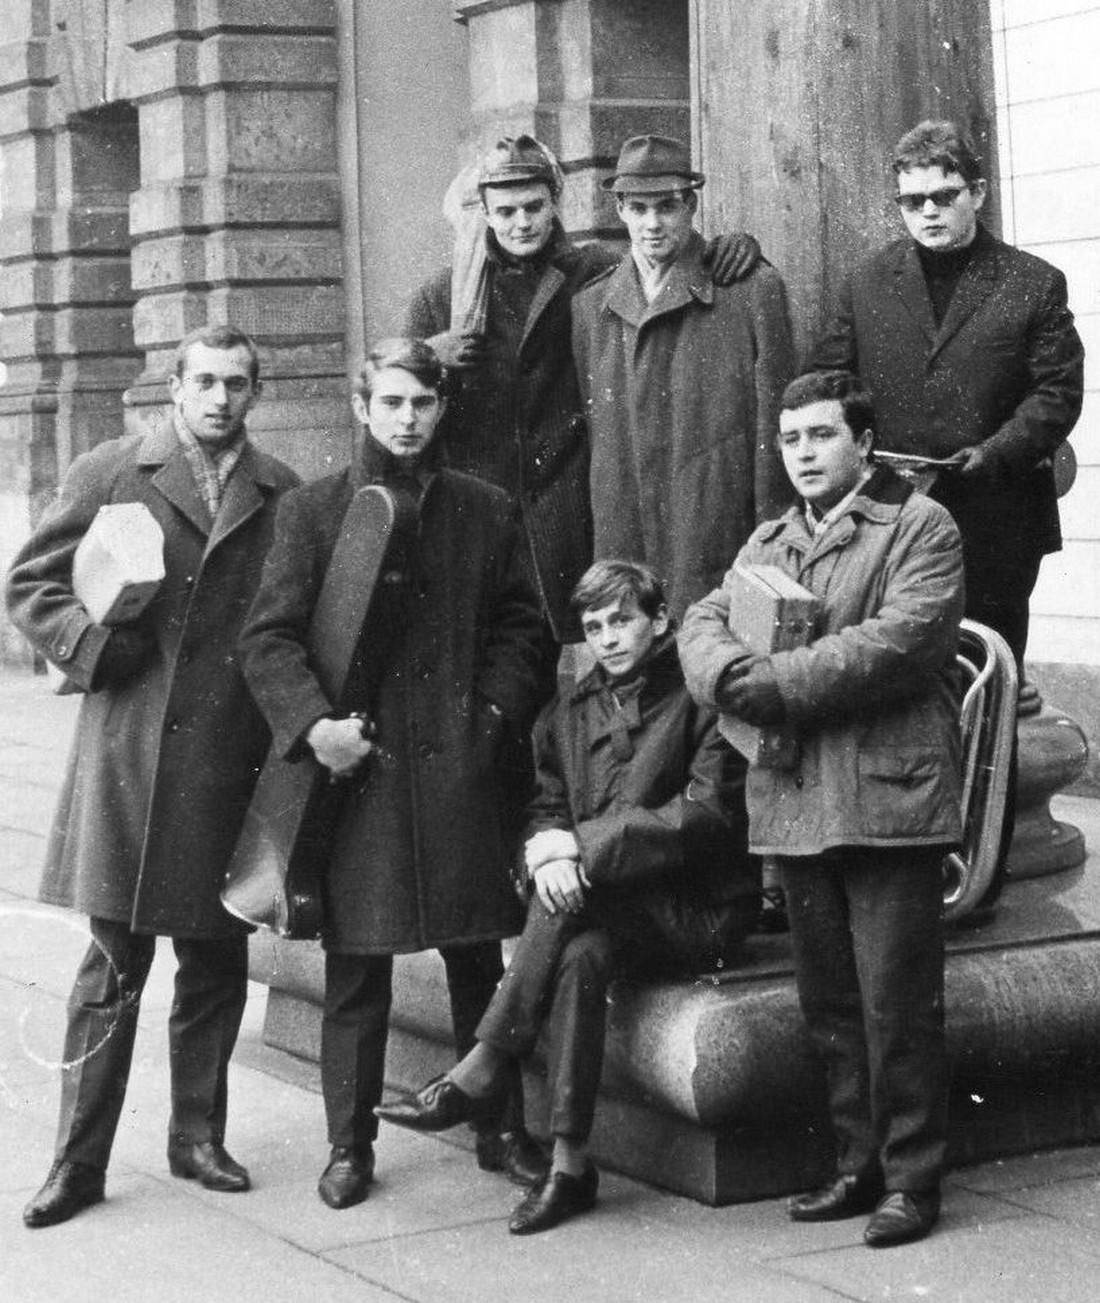 Zľava Vladimír Šifter, Marián Nepela,Štefan Dugas,  Ján Humeňanský, Kaisi, Ivan Benko, Ján Novák